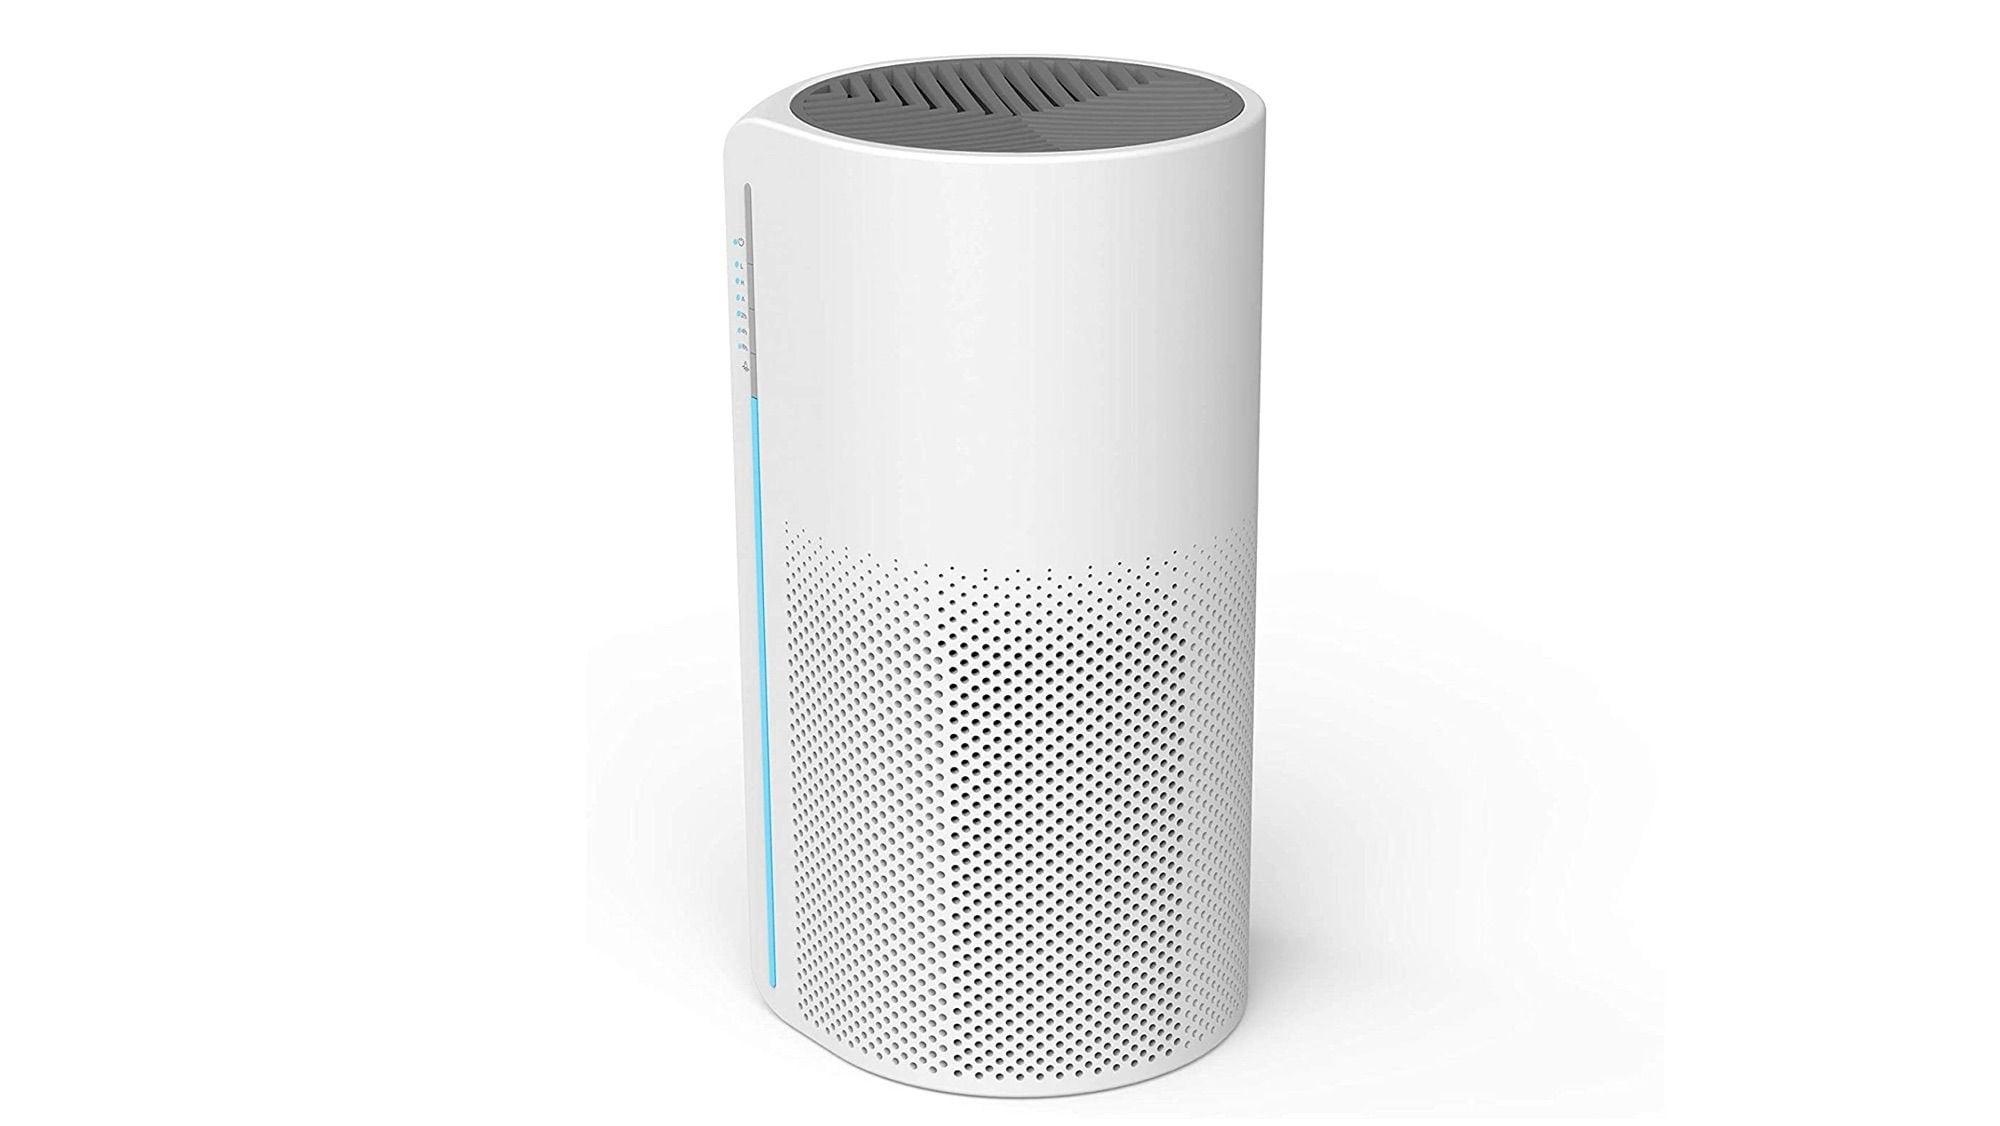 The Sensibo Pure air purifier gains HomeKit support